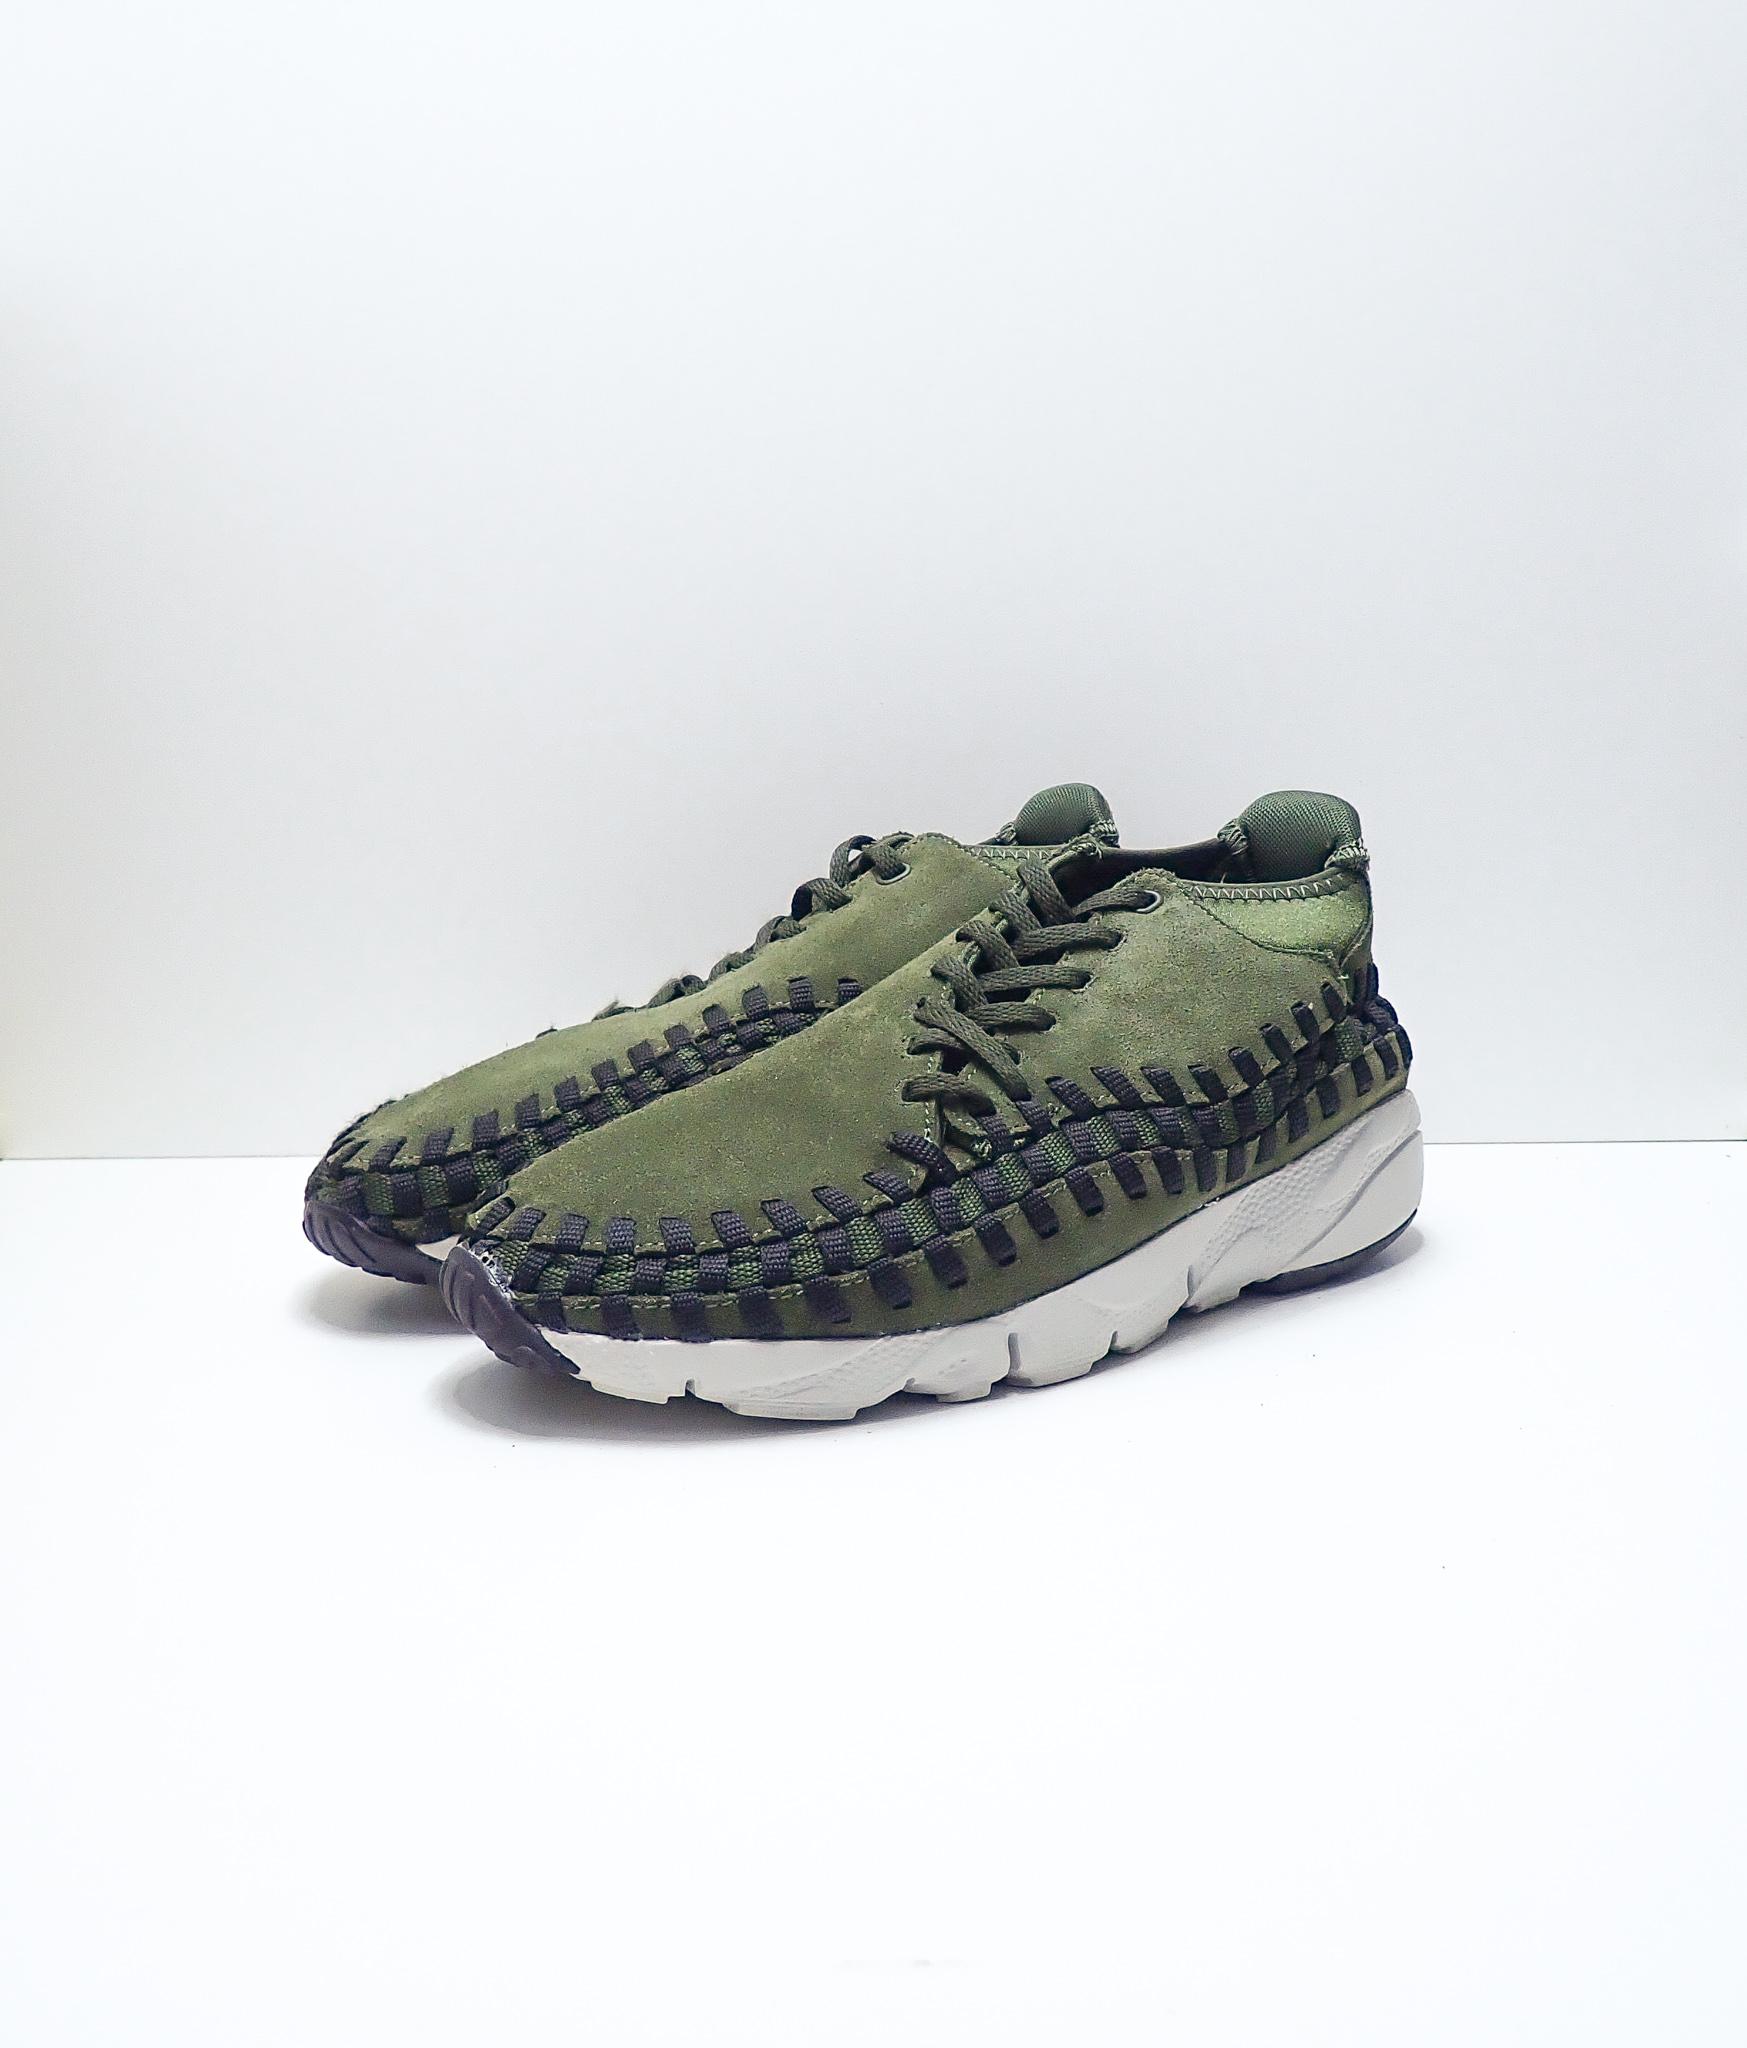 Nike Air Footscape Woven Chukka Green